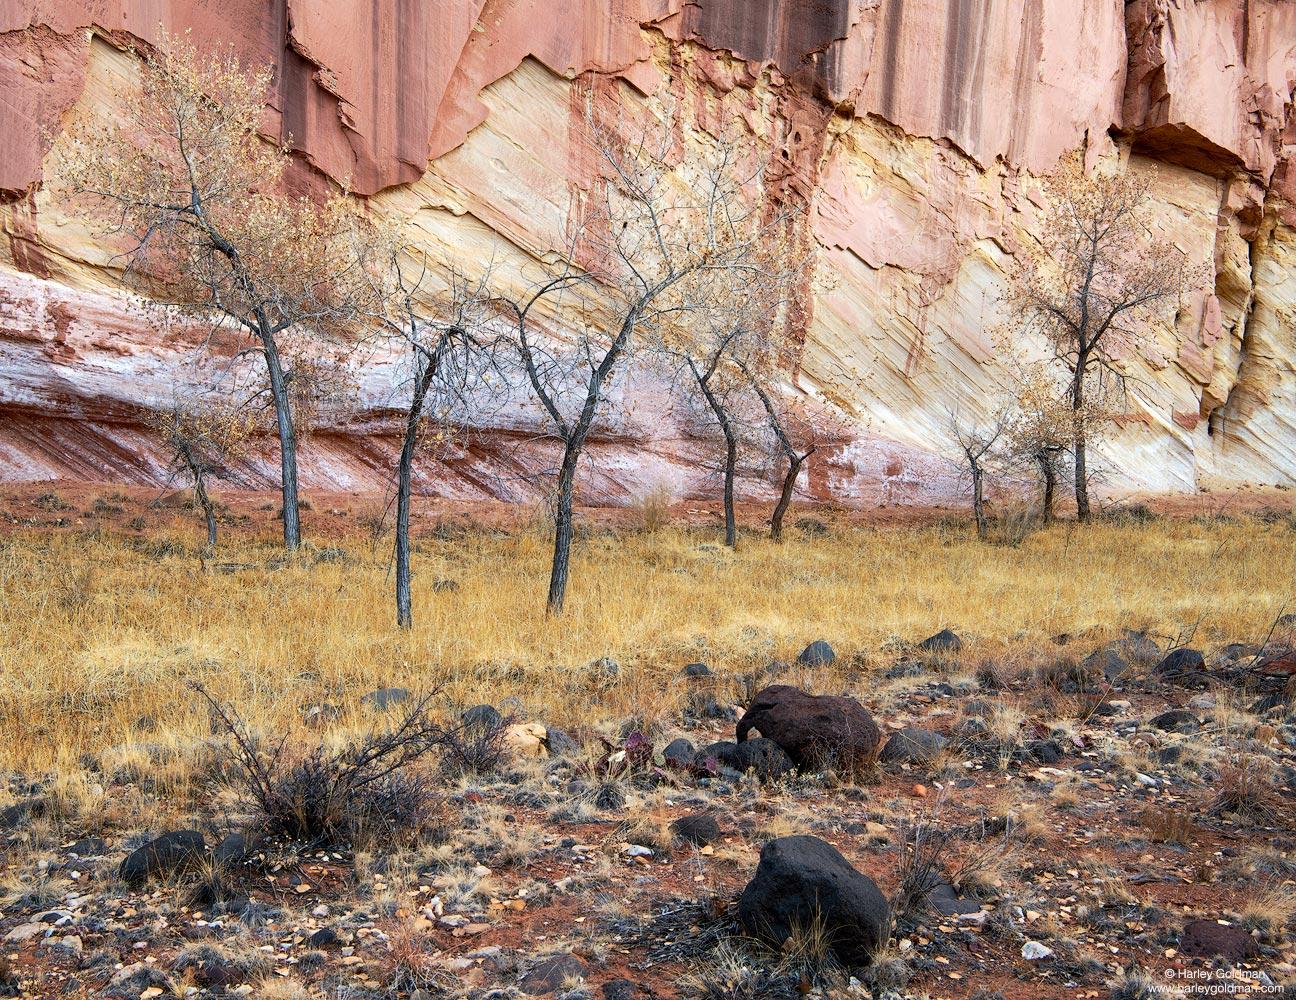 winter, trees, Utah, grass, wall, rock, sandstone